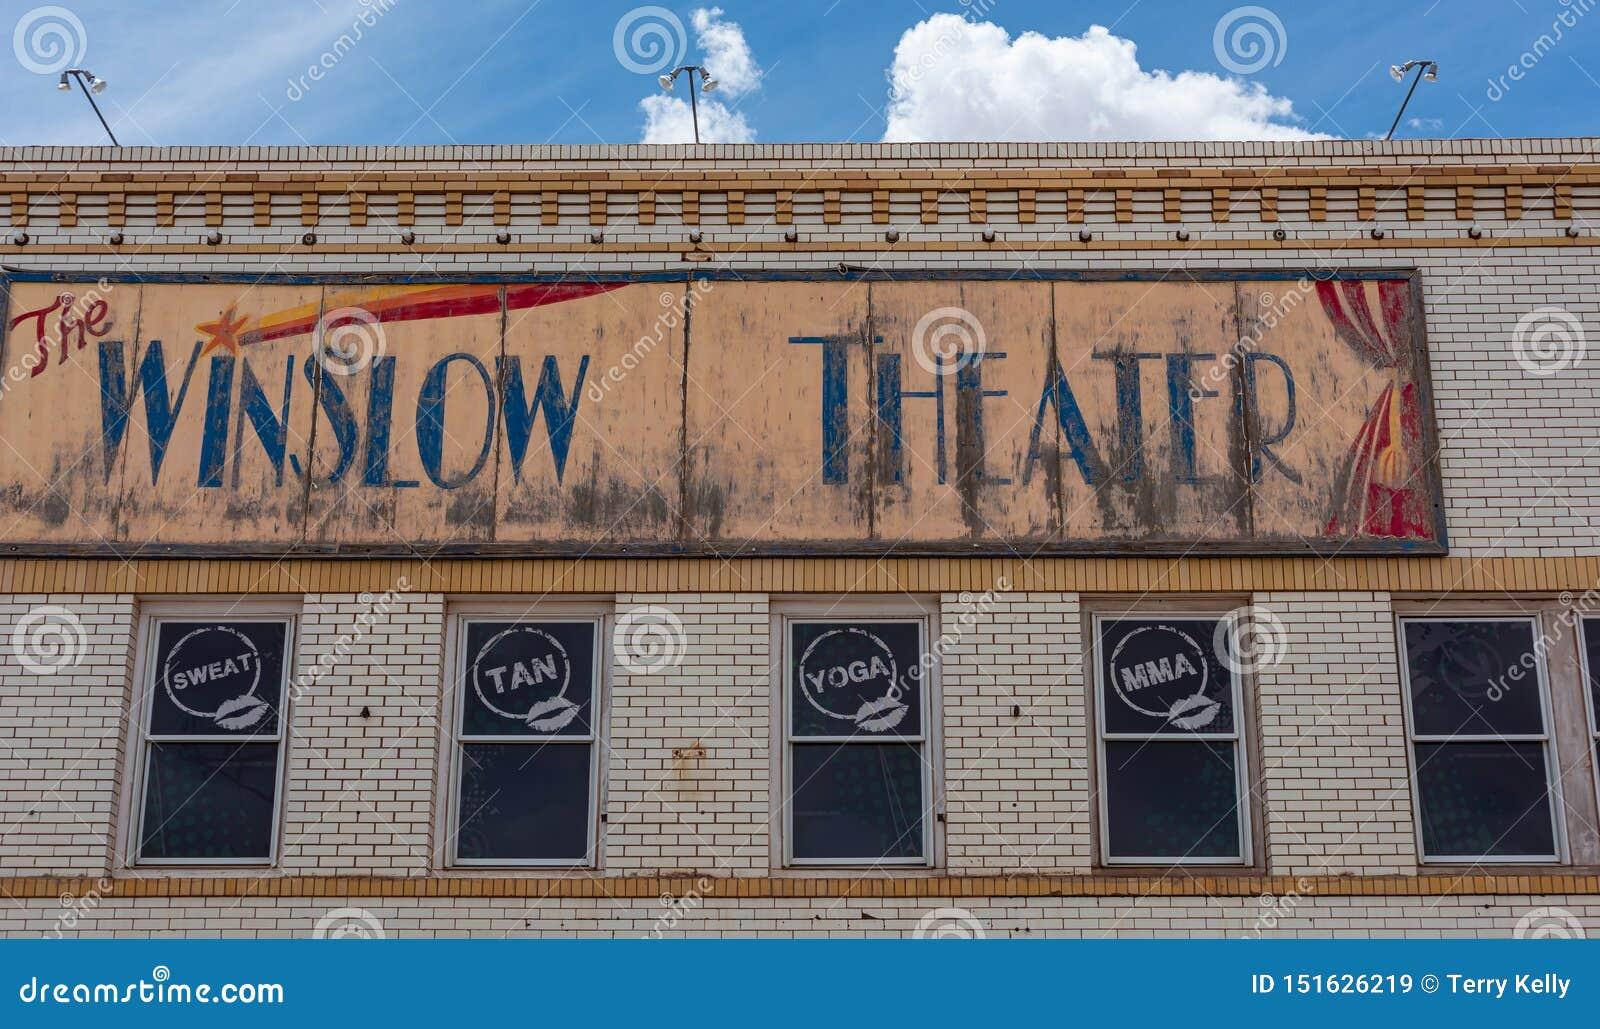 Winslow Theater